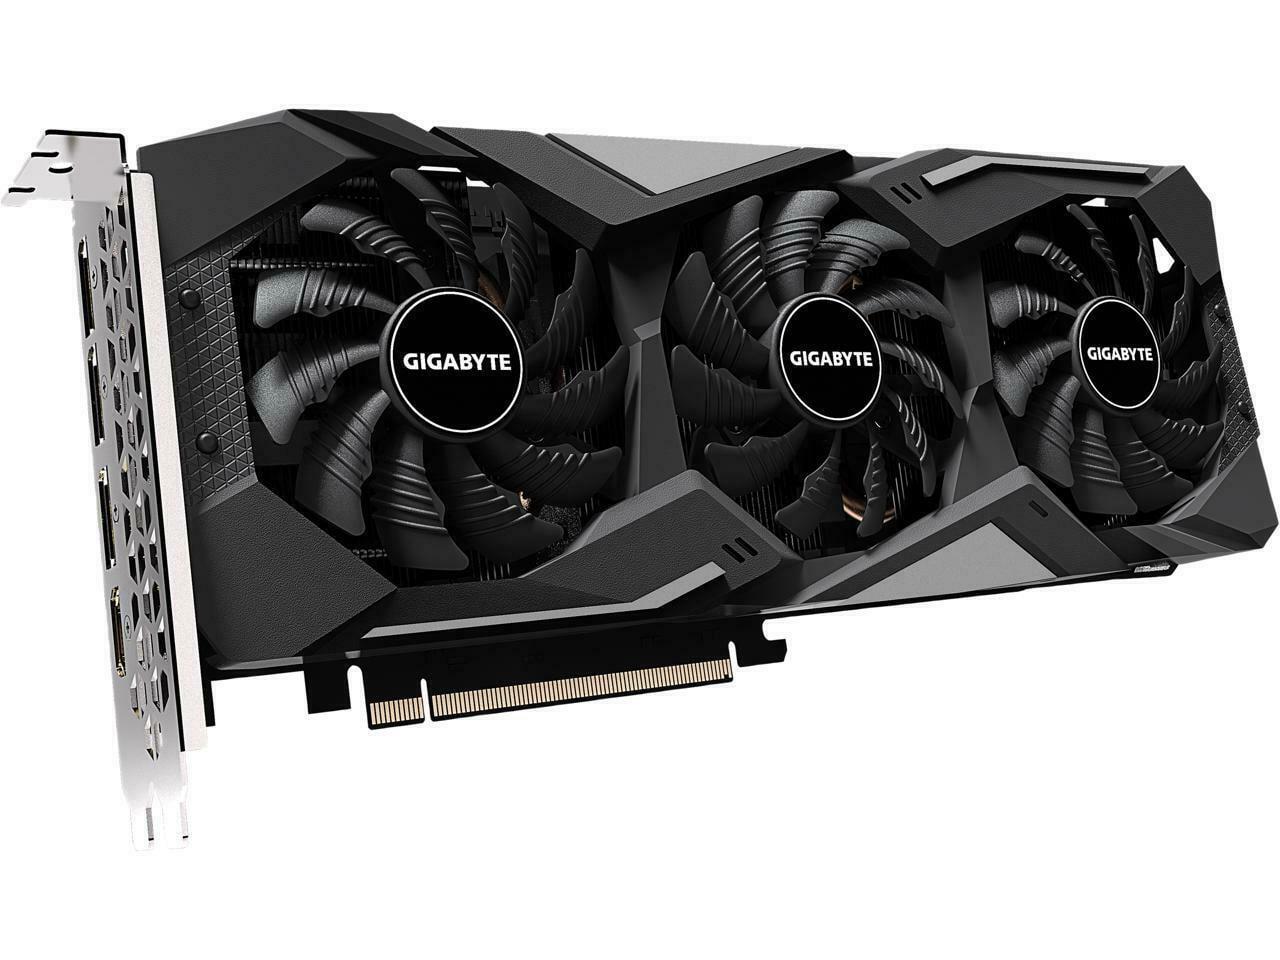 Gigabyte 2018 Newest Radeon RX 570 DirectX 12 GV-RX57OGAMING-4GD 4GB 256-Bit GDDR5 PCI Express 3.0 x16 CrossFireX Support ATX Video Card